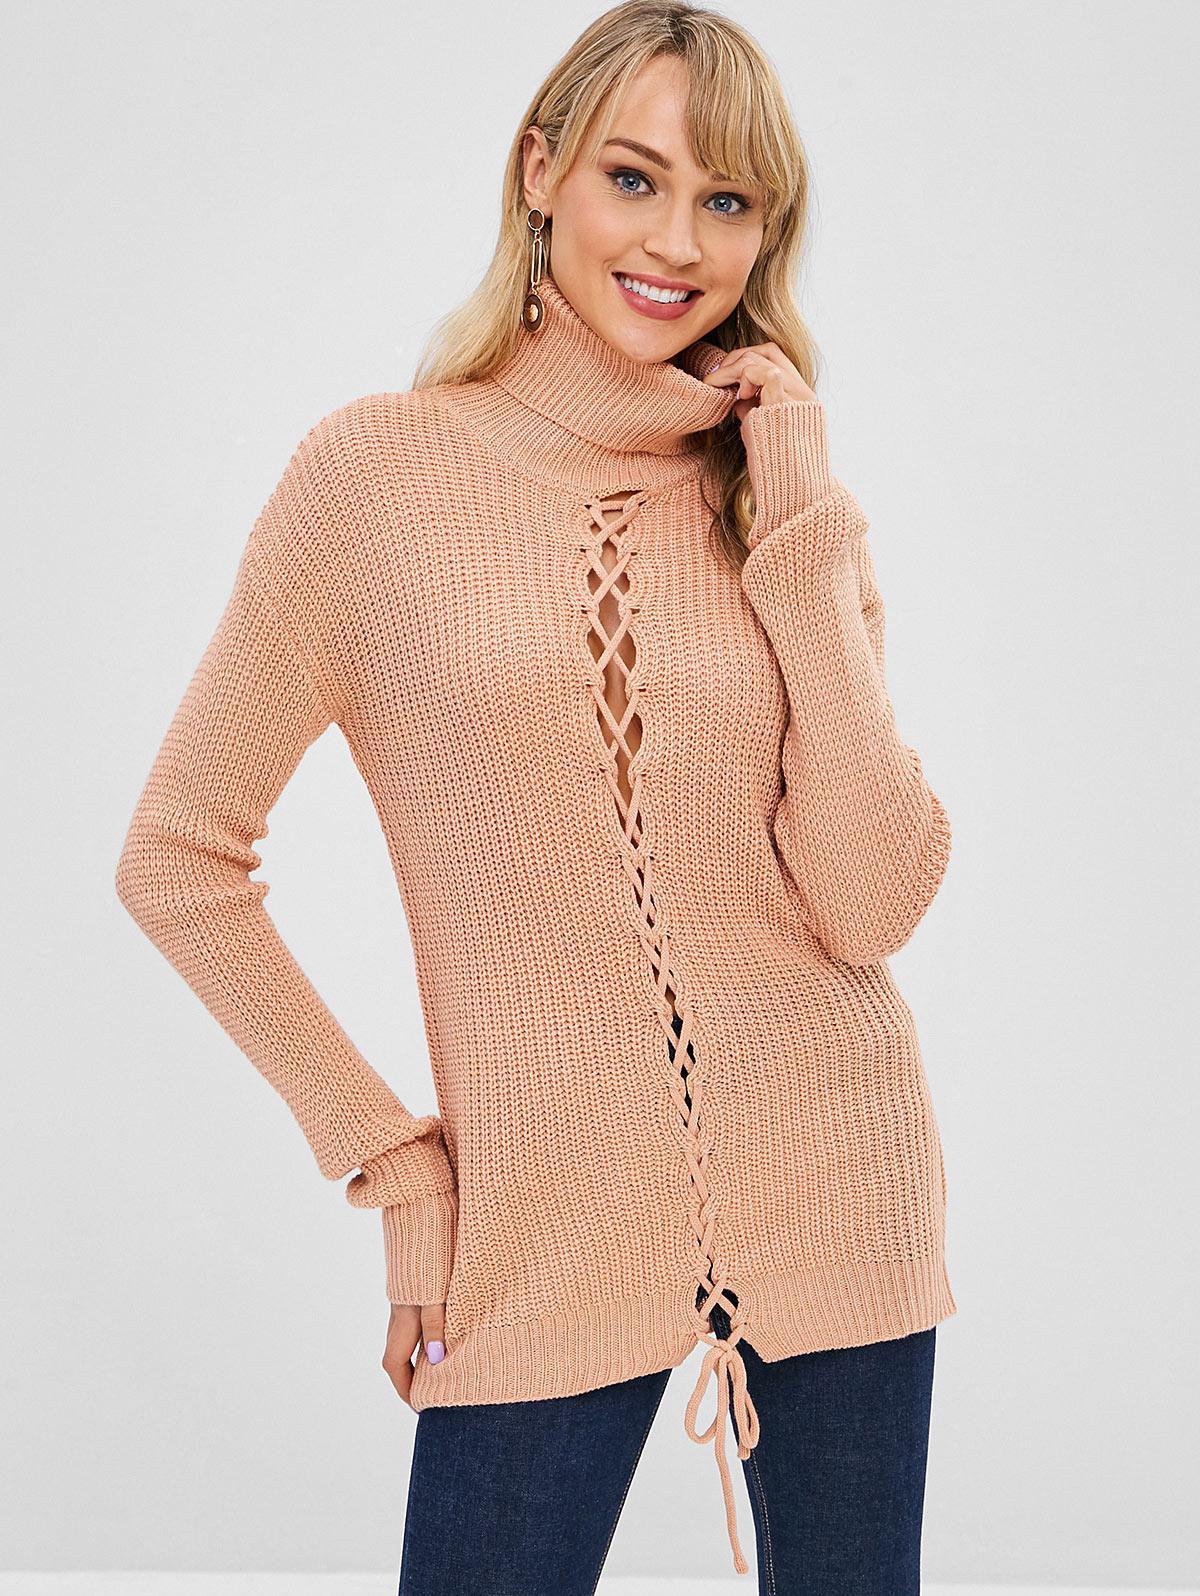 Turtleneck Lace Up Drop Shoulder Sweater